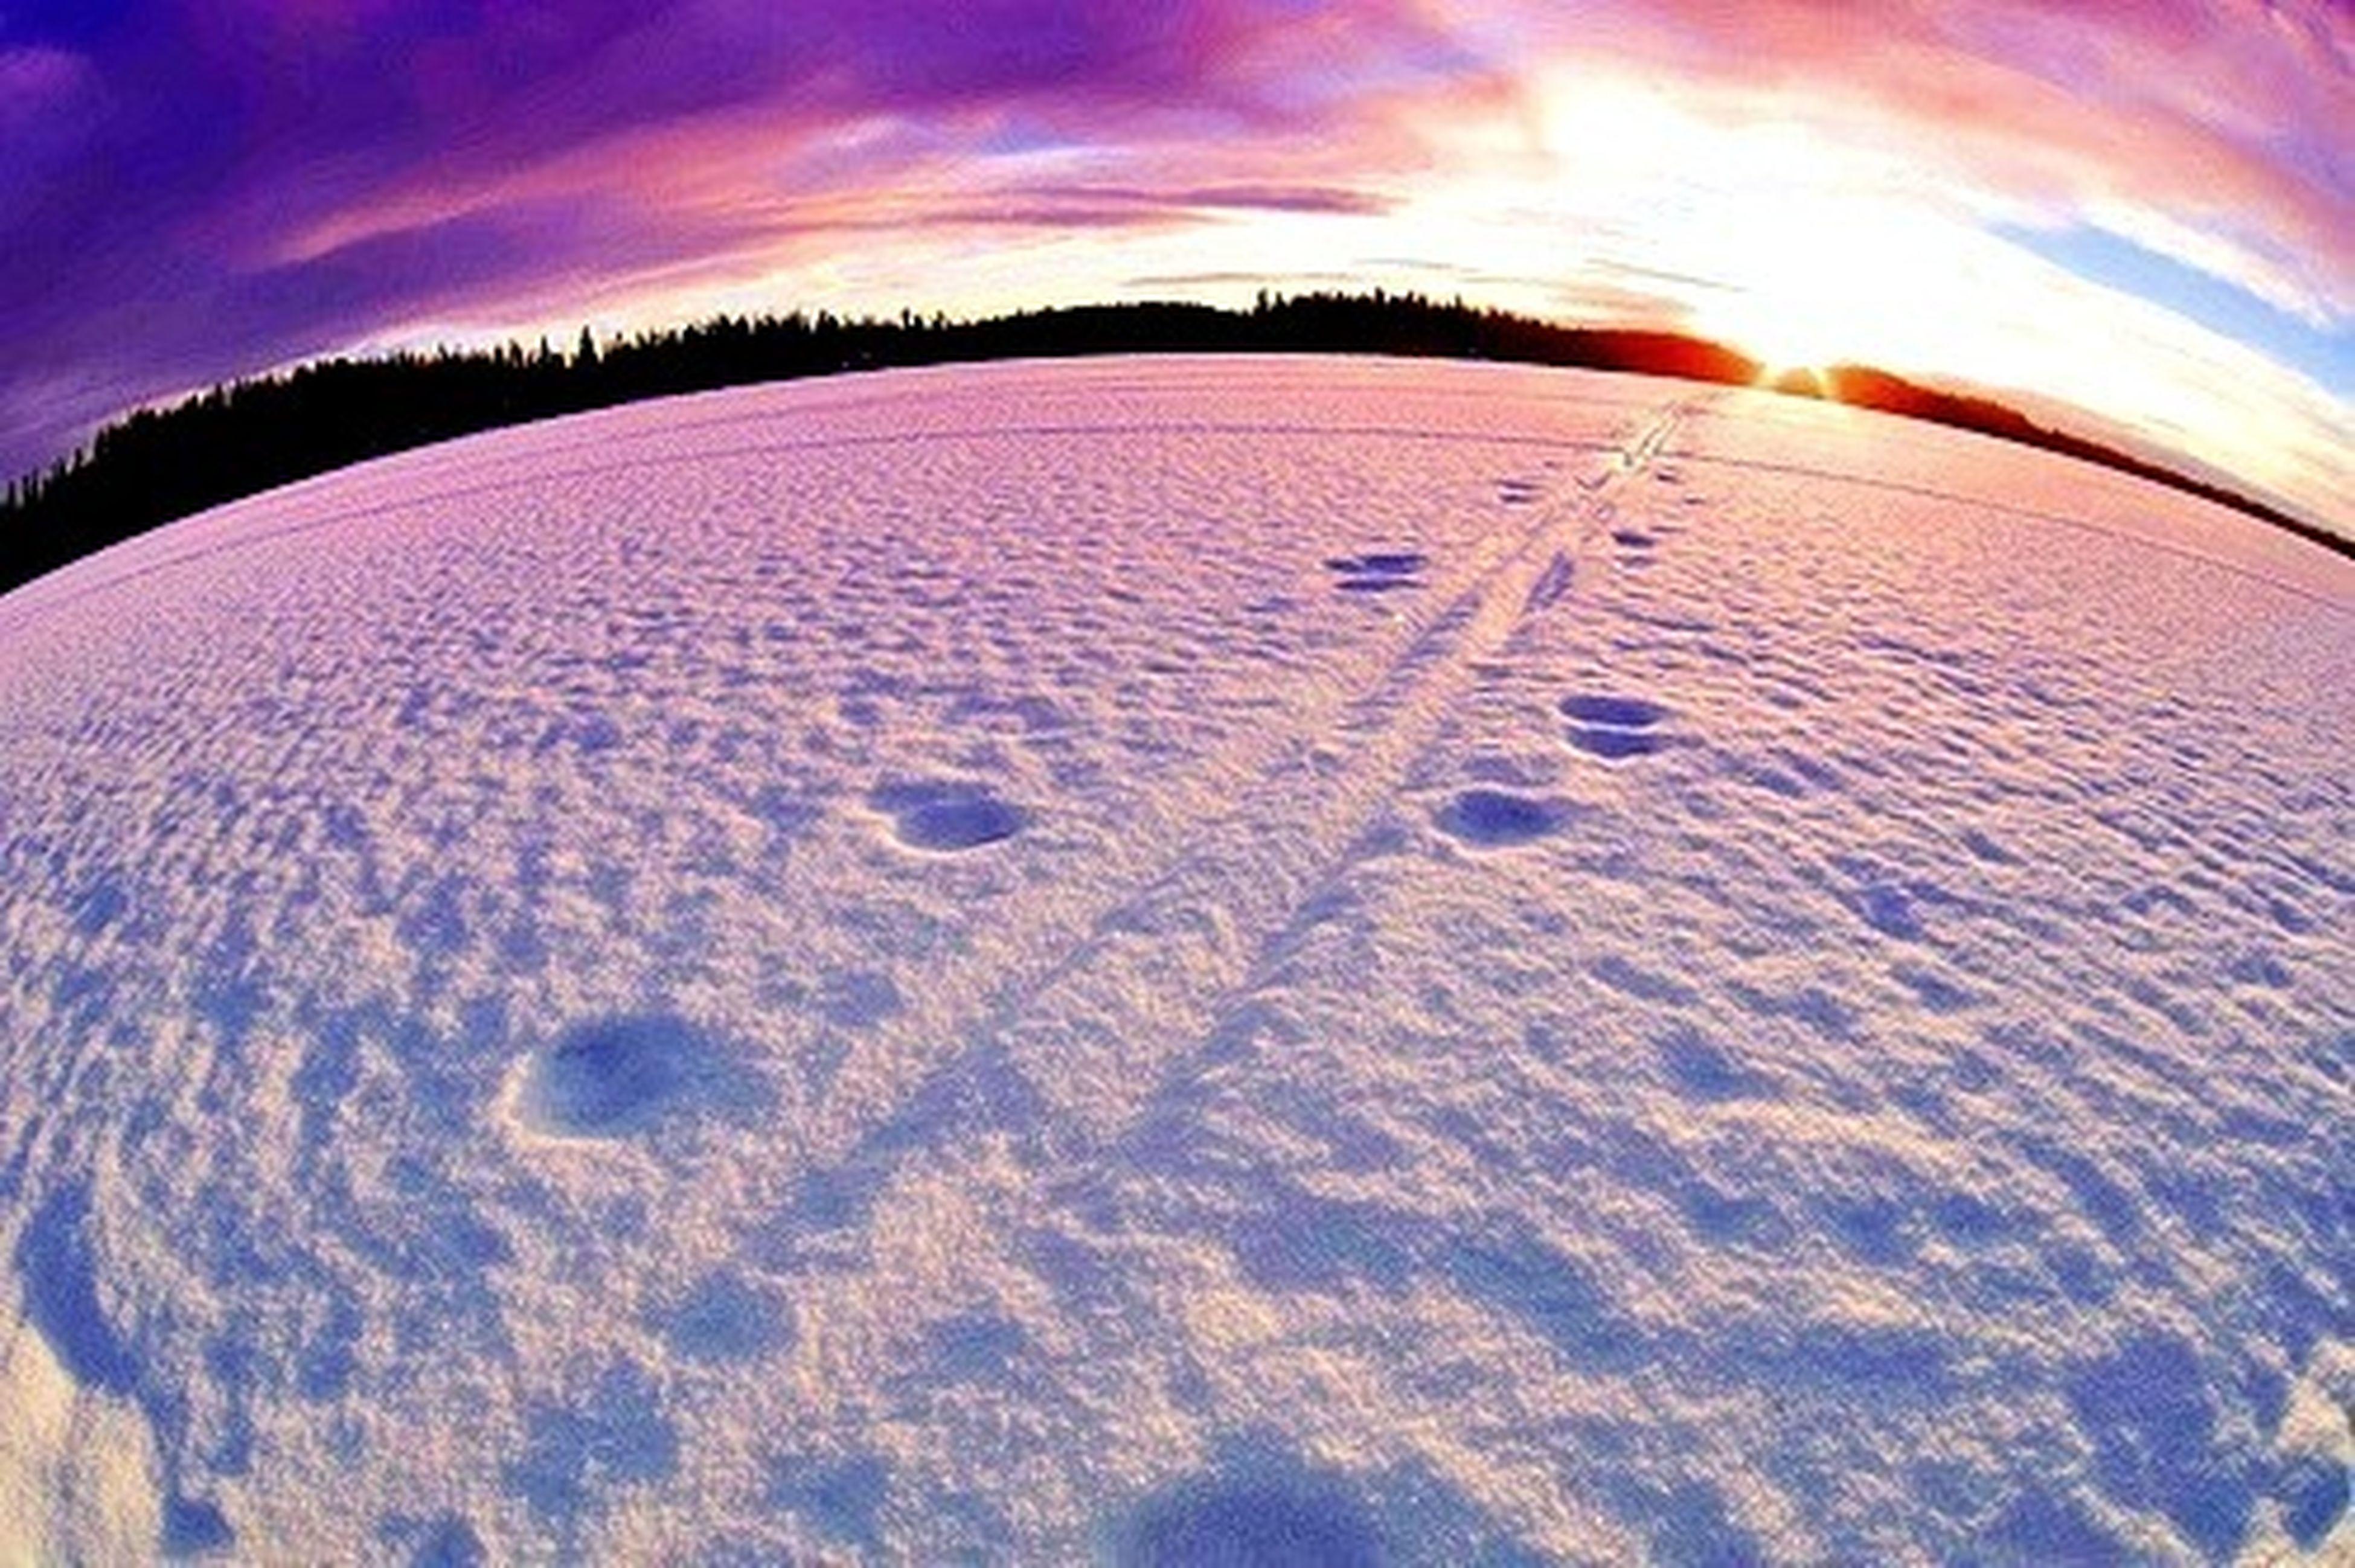 sunset, sky, cloud - sky, scenics, tranquil scene, beauty in nature, tranquility, nature, weather, sun, landscape, sand, cloud, cold temperature, snow, sunlight, idyllic, outdoors, cloudy, orange color